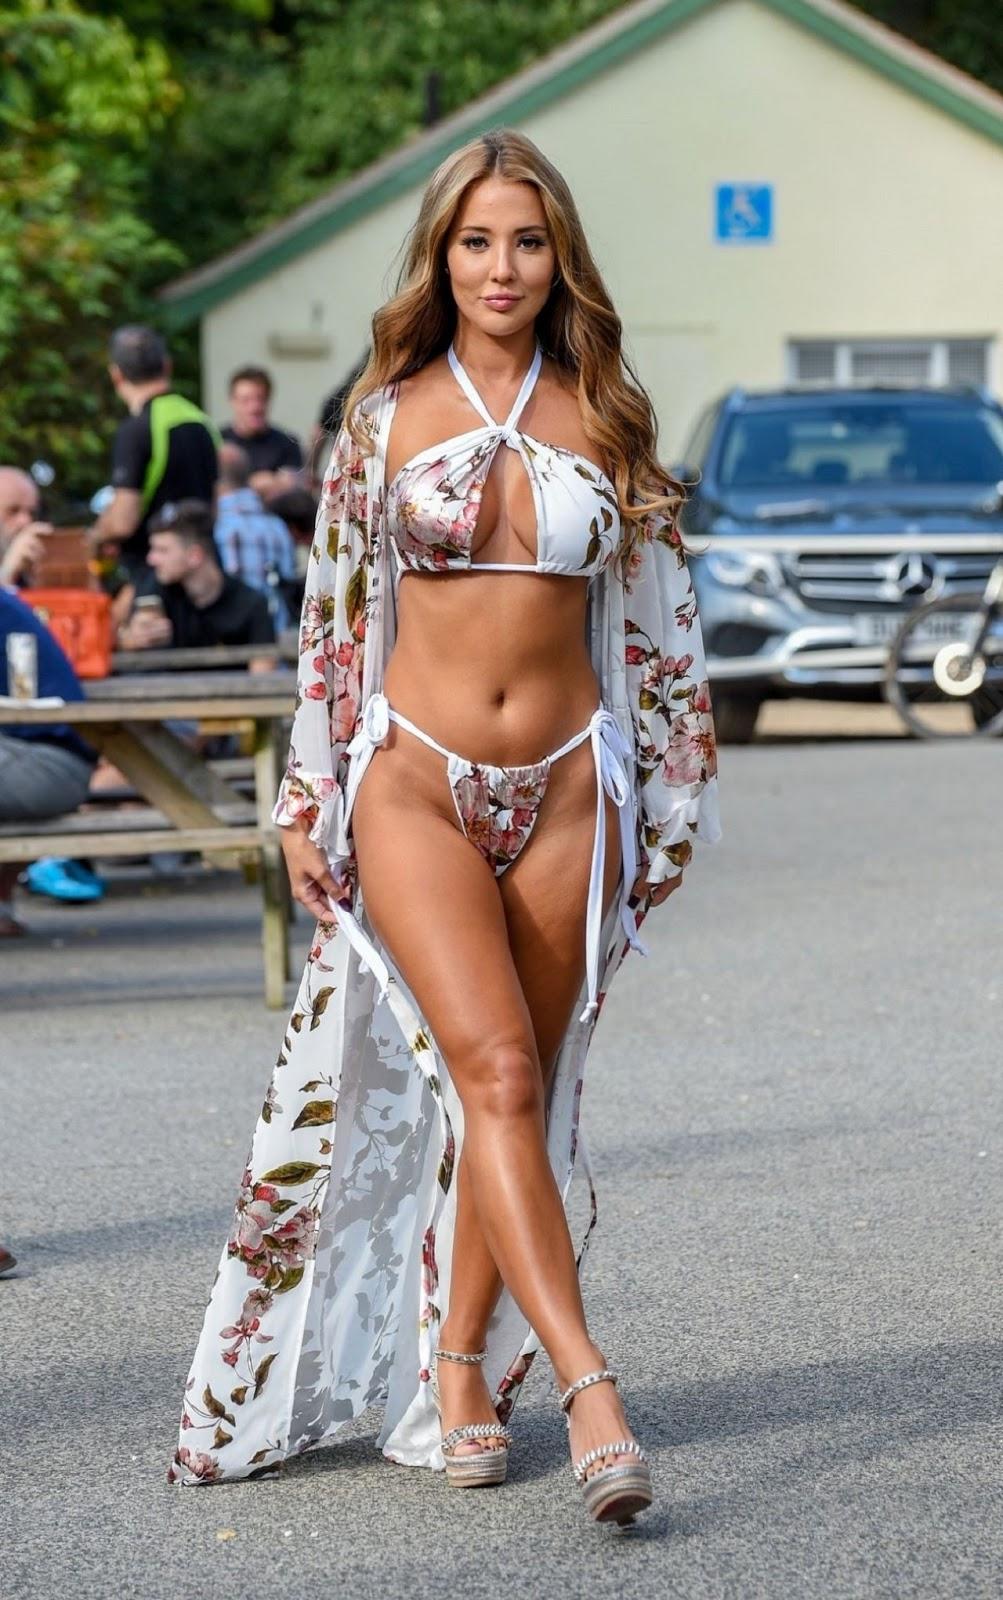 Amy Acker Bikini yazmin oukhellou in a bikini at a pool party in essex 08/22/2019